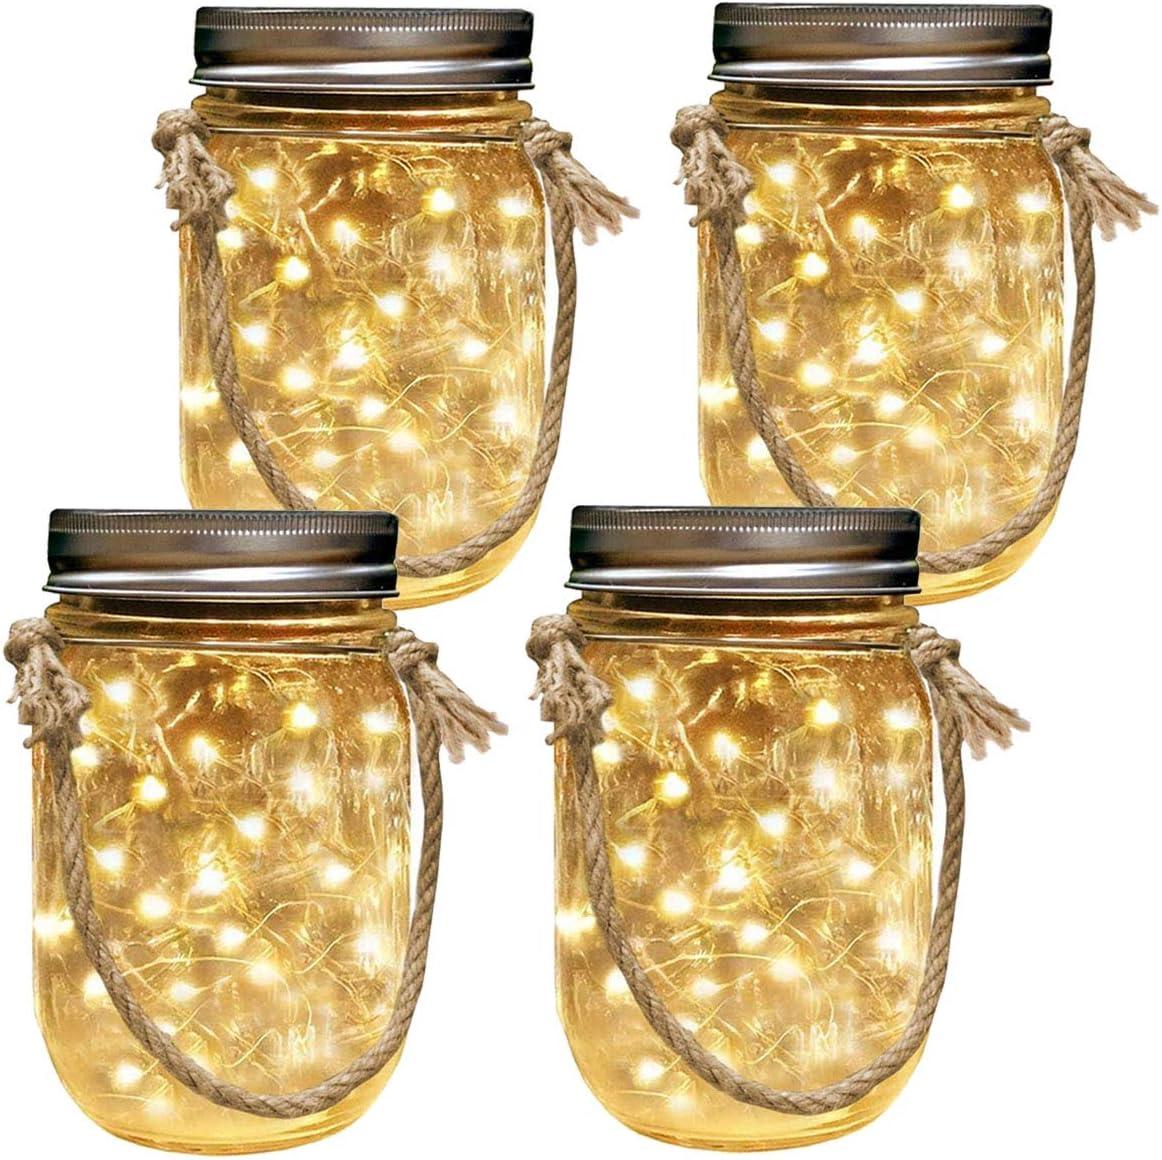 Homeleo 4-Pack Solar-Powered Mason Jar Lights Kits Lid Lights,Mason Jars,Hangers Included ,LED Star Fairy Firefly Vintage Jar Lights Set for Christmas Decoration Outdoor Garden Yard Patio Path Decor